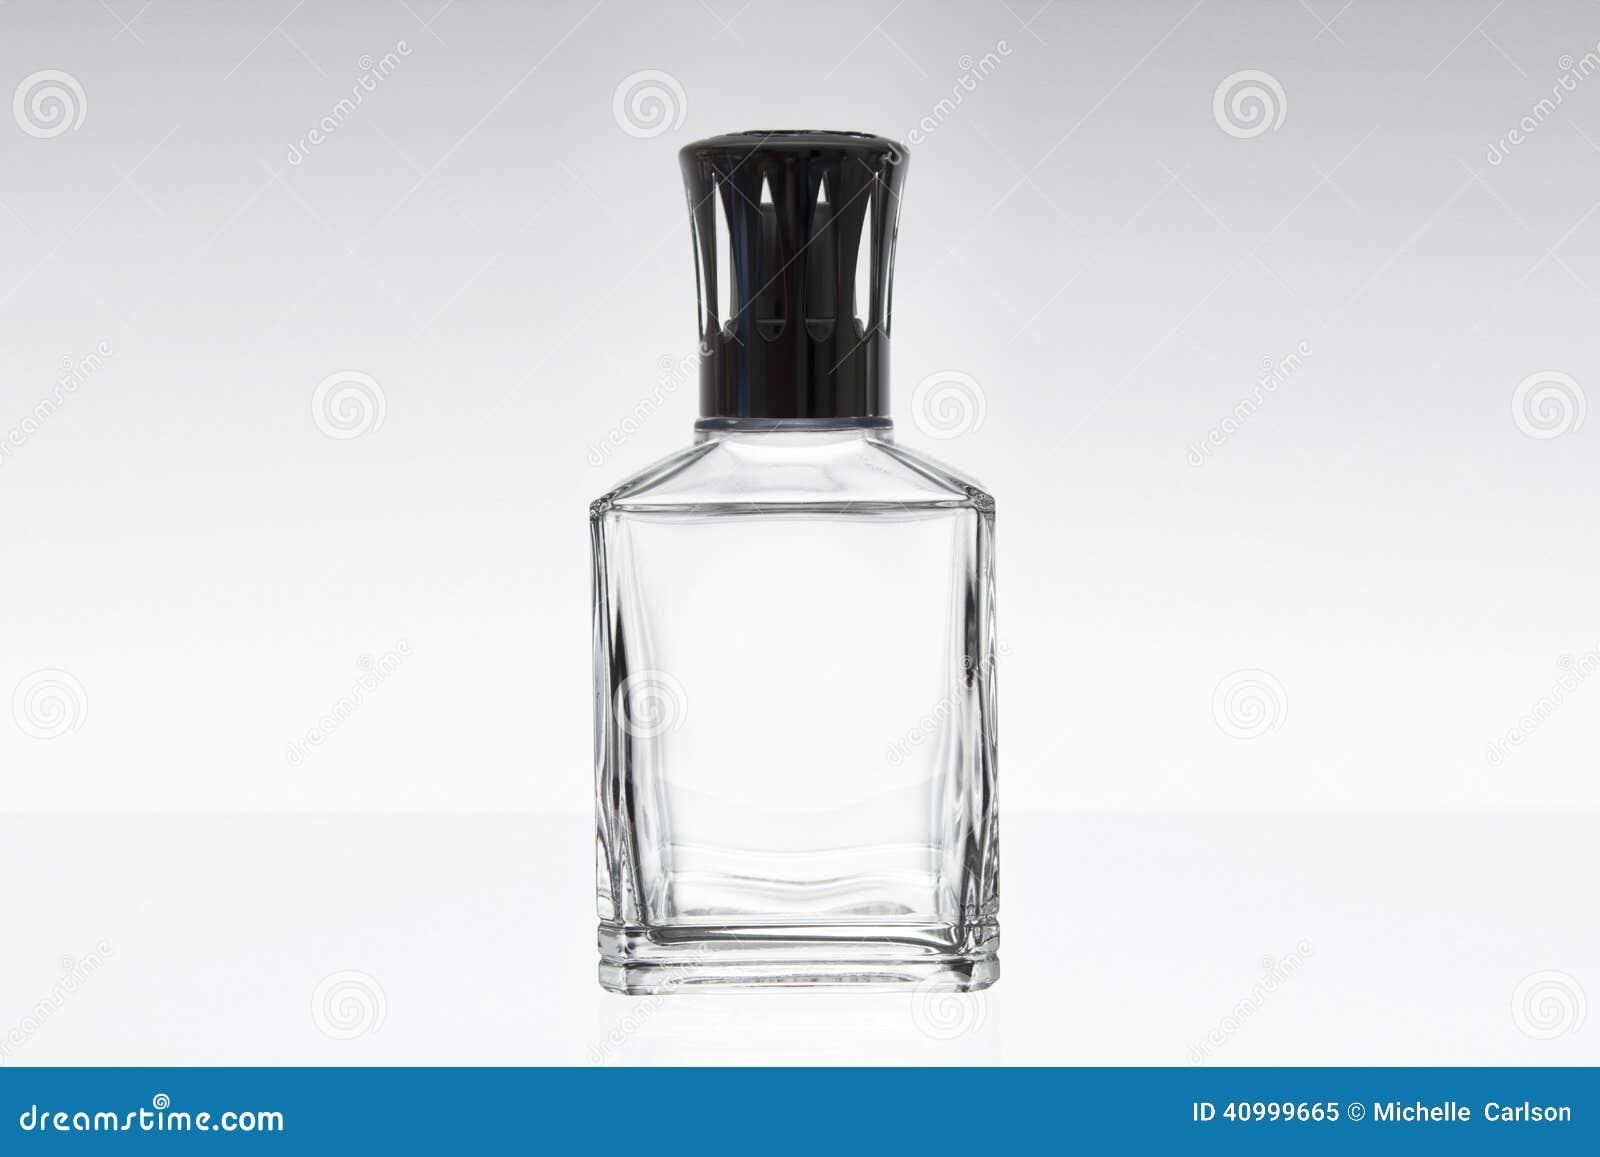 Pussy Fragrance In A Bottle 30